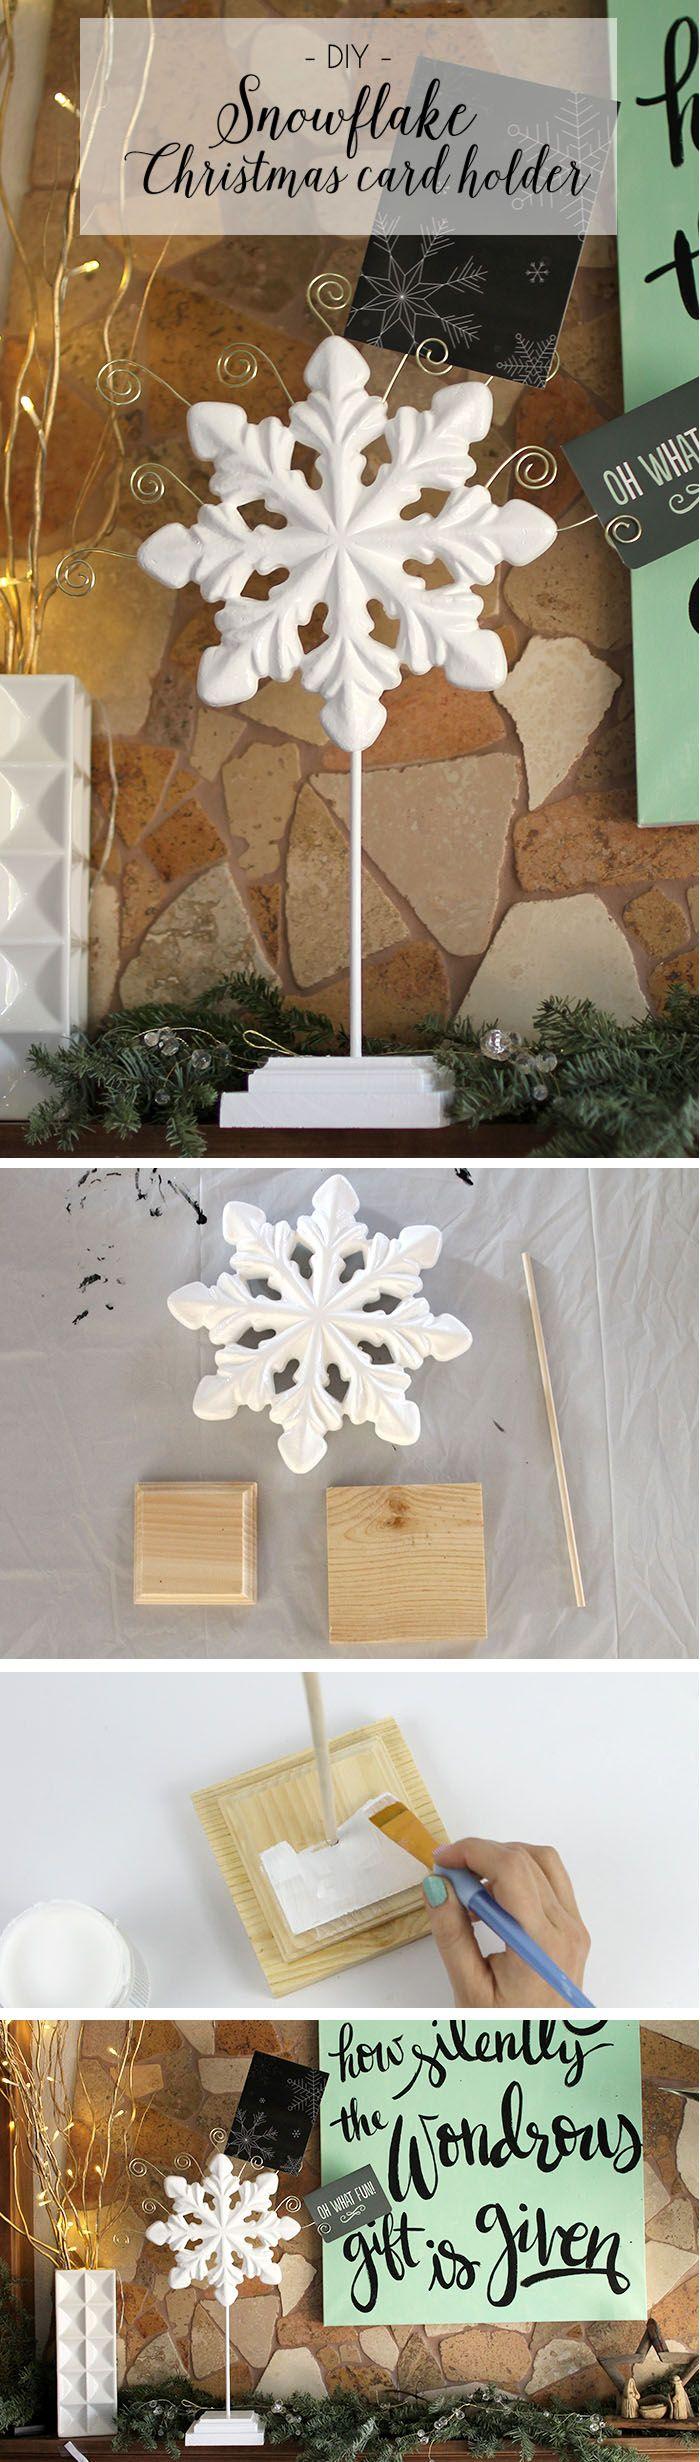 Diy retro christmas decorations - Diy Snowflake Christmas Card Holder